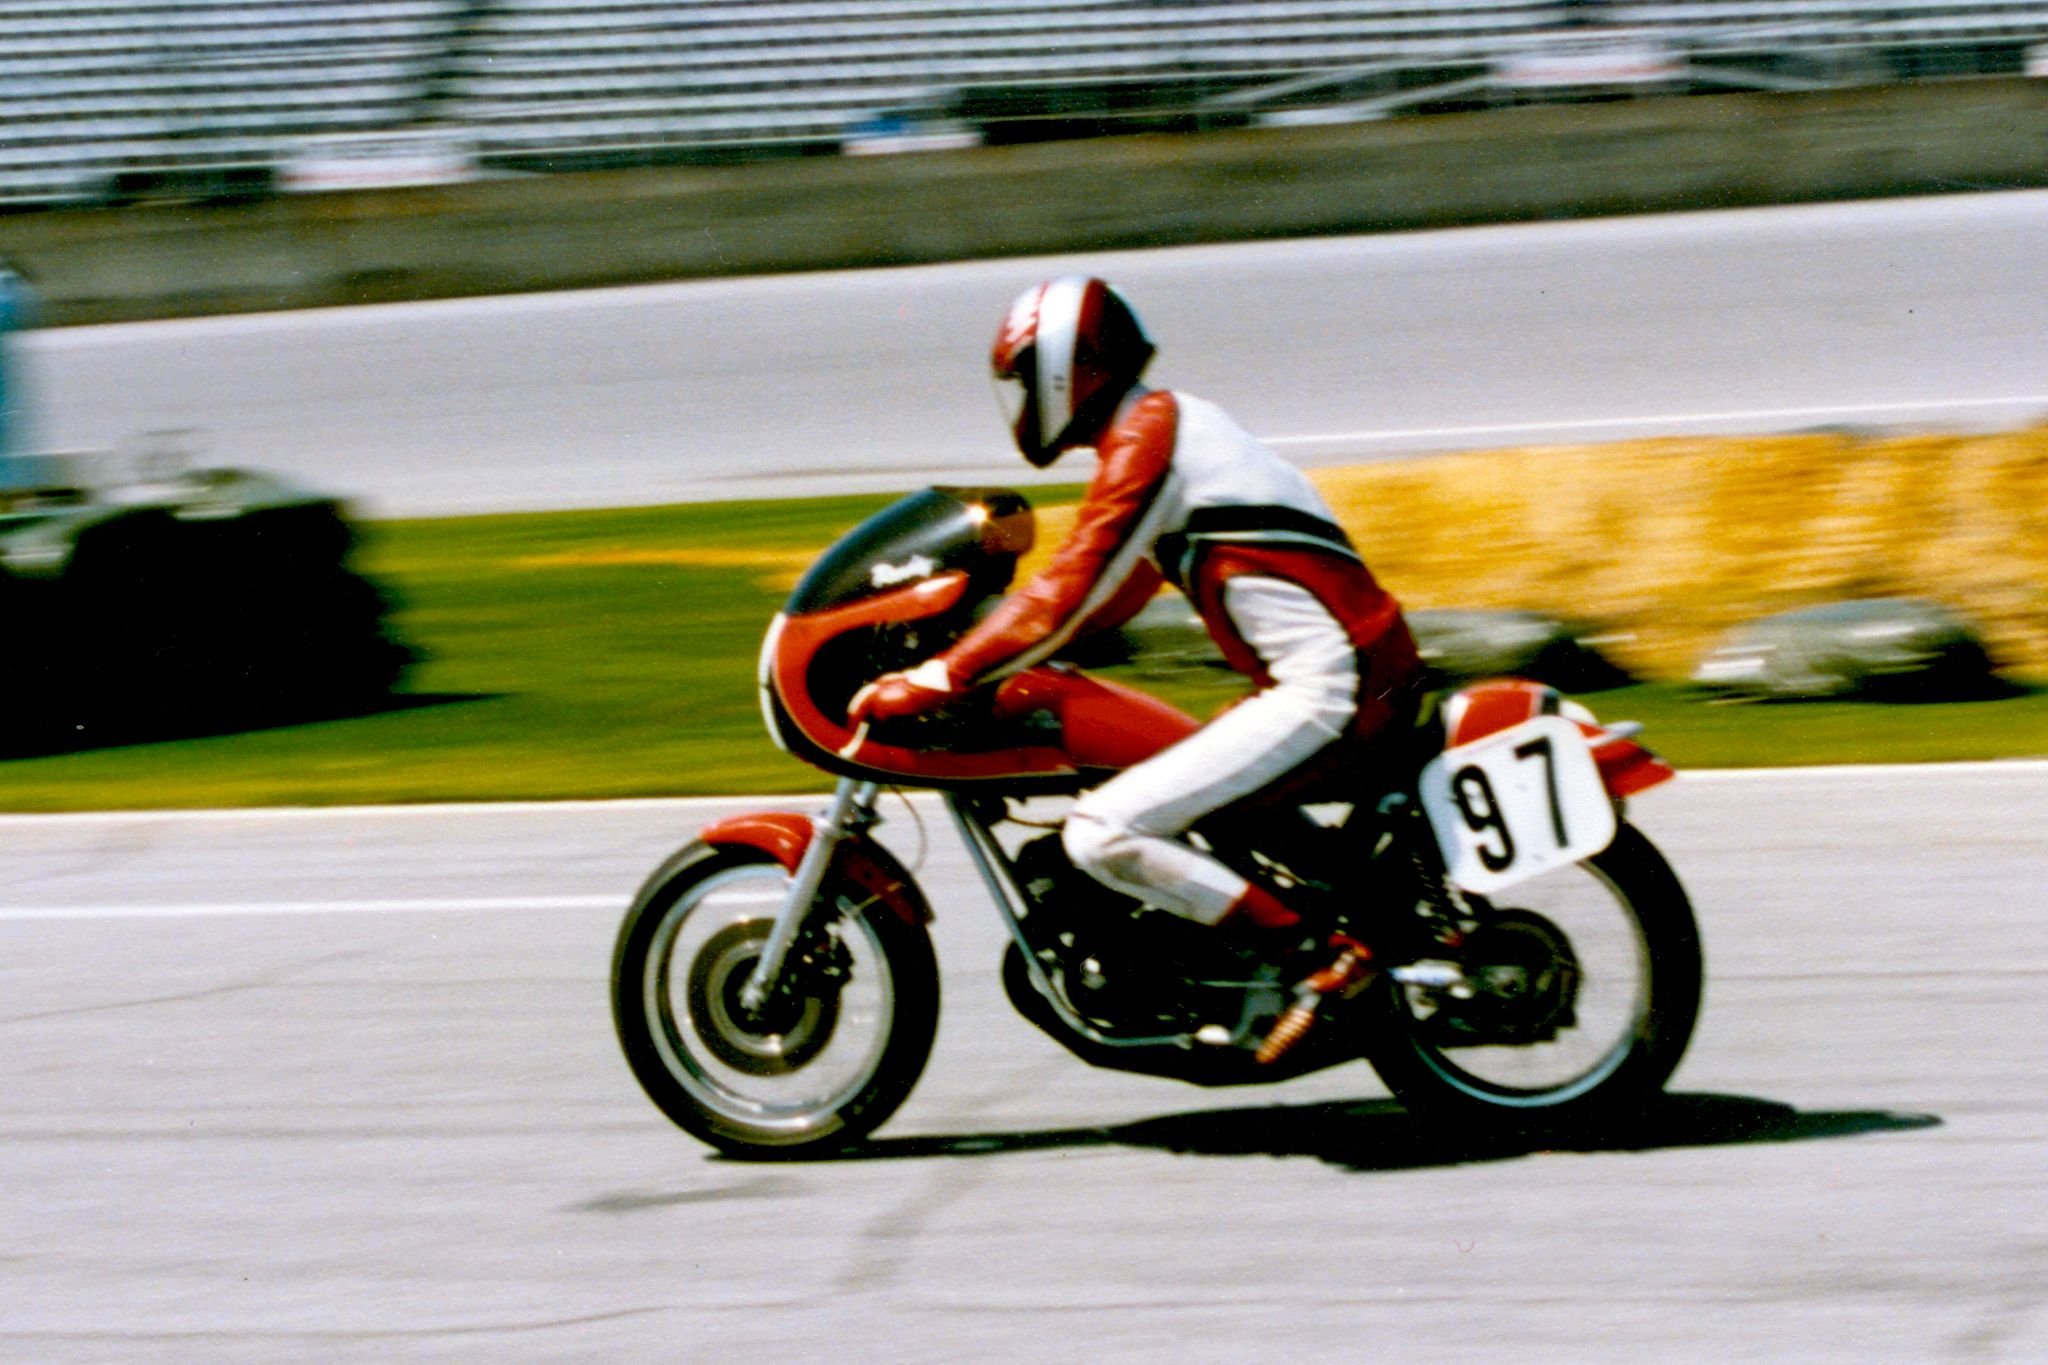 Daytona Go Faster by BadgerBob